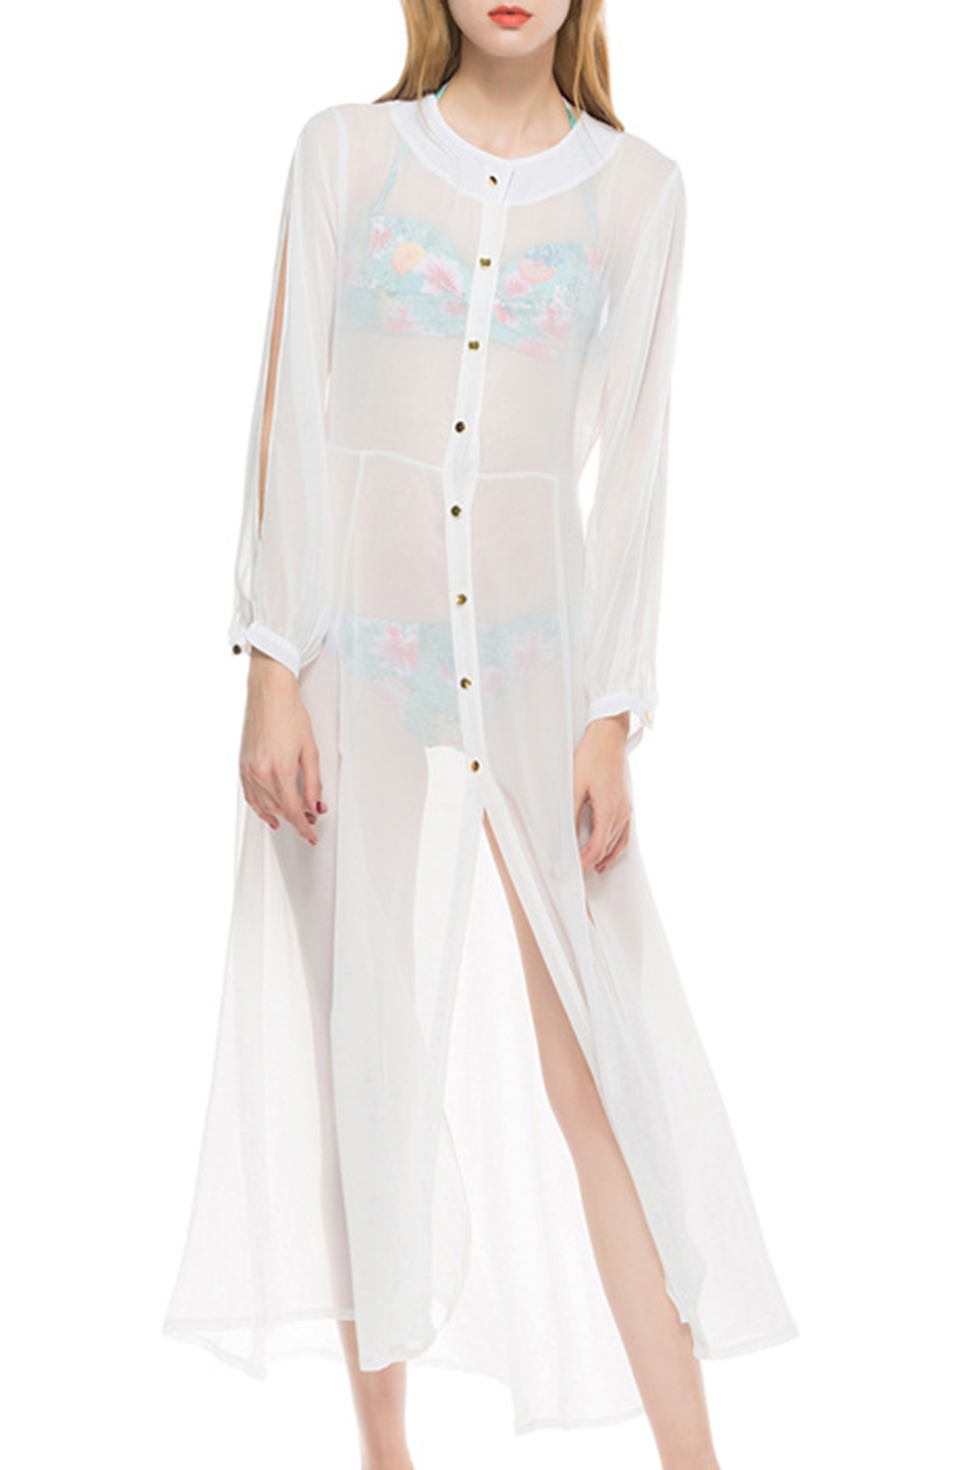 Hot Stylish White Sheer Chiffon Long Sleeve Button Down Sunscreen Holiday Maxi Shirt Dress Bikini Cover Up Dress